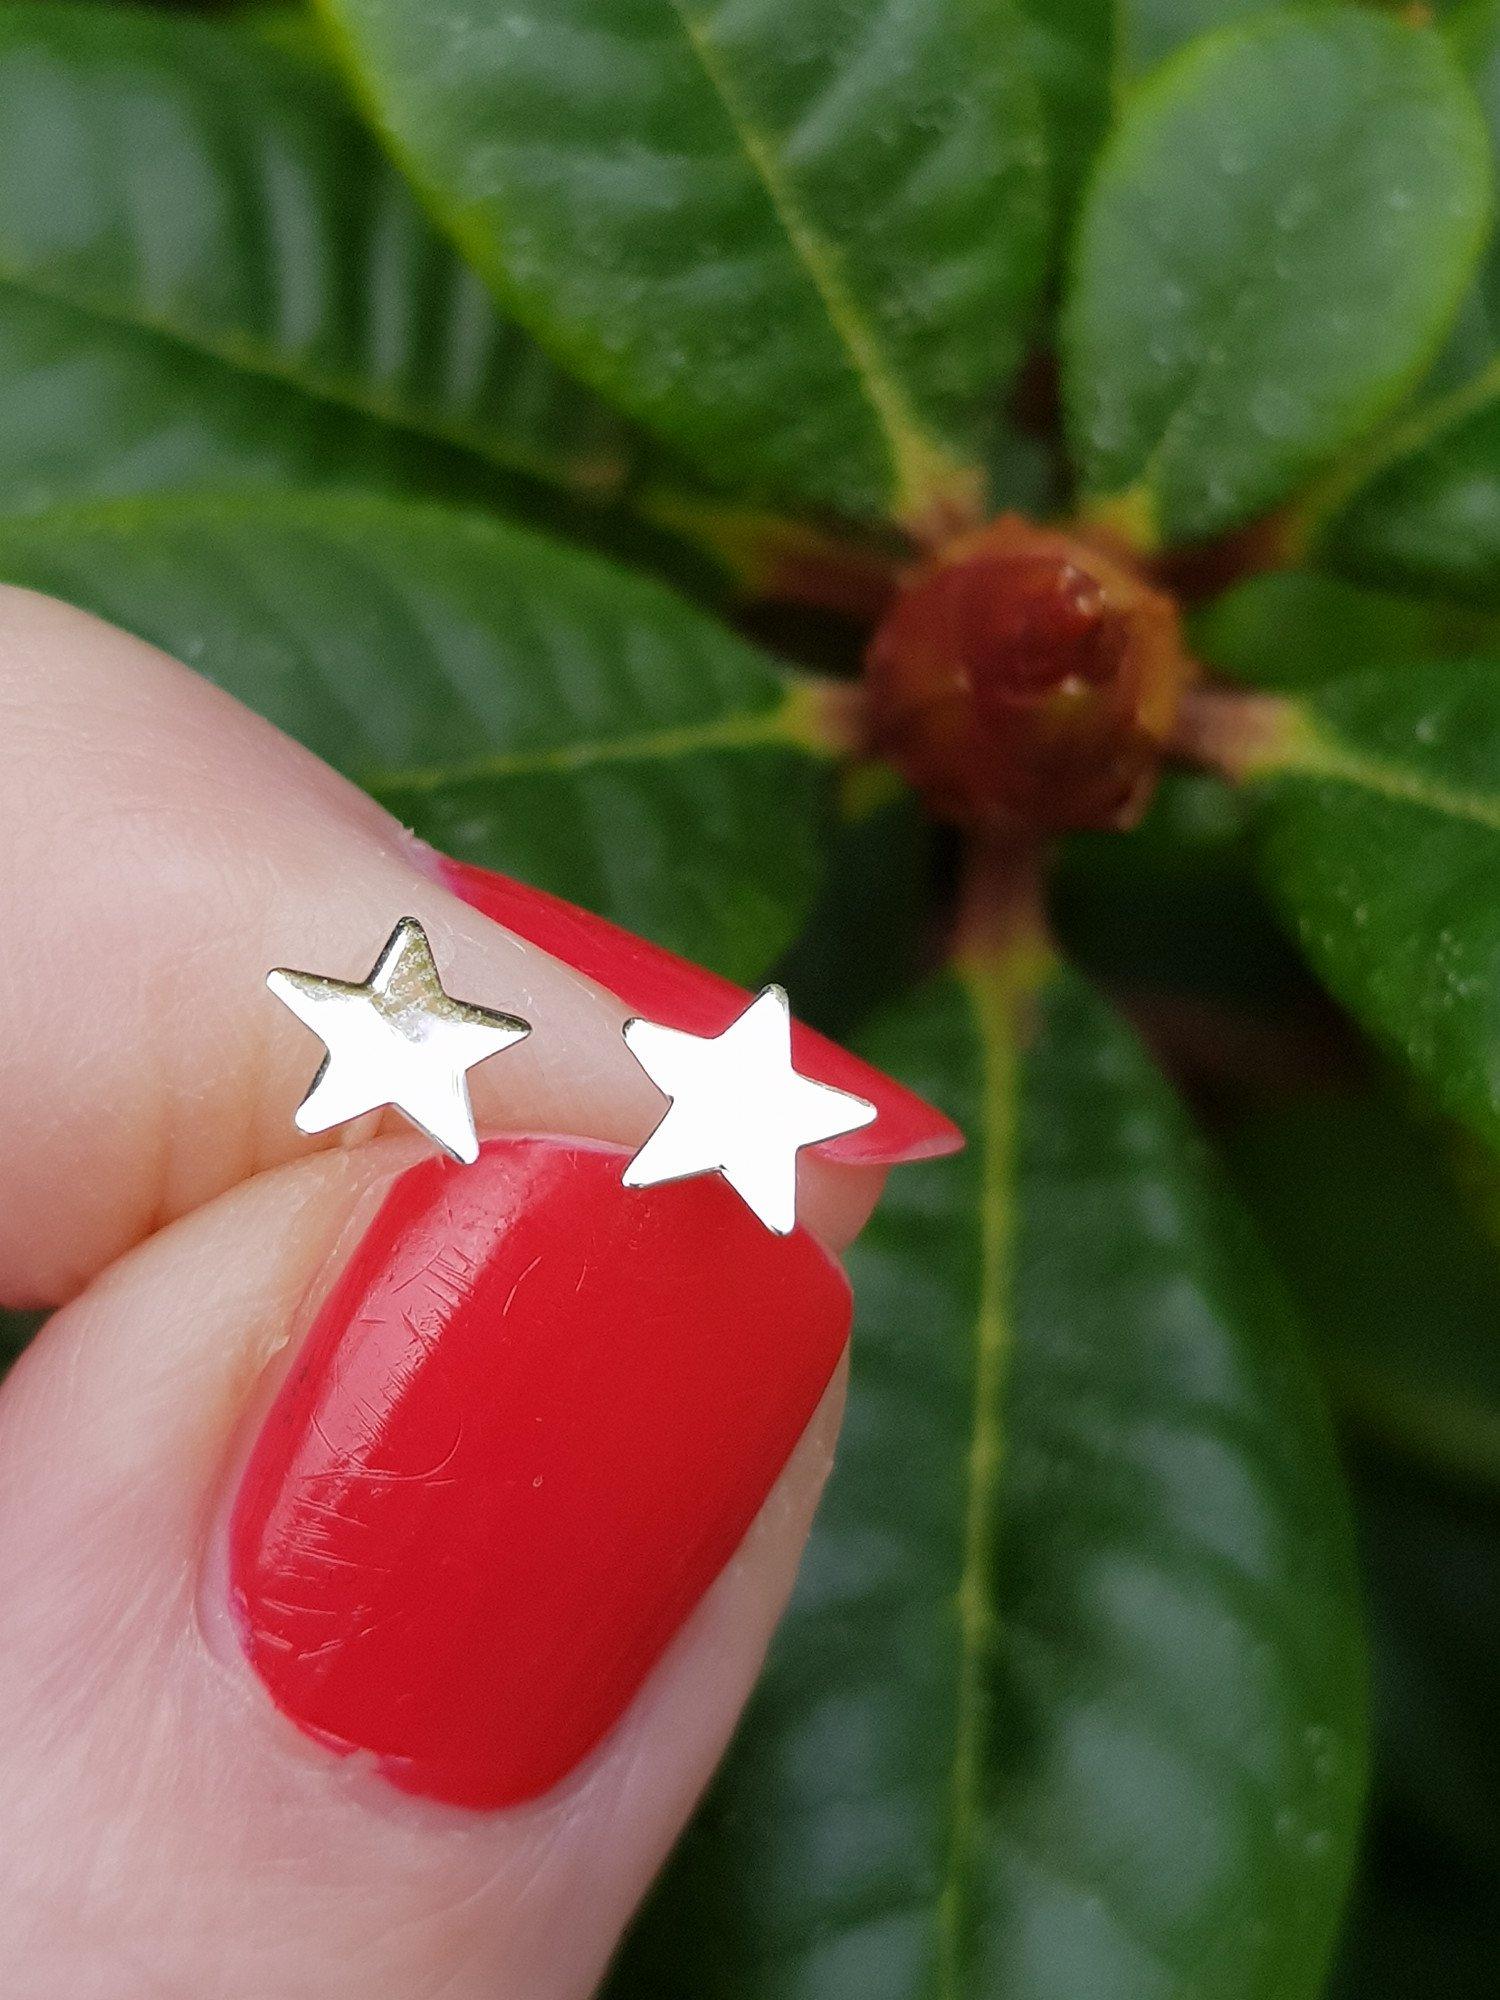 BEAUTIFUL JEWELLERY WITH STARS FROM CALLIBEAU JEWELLERY